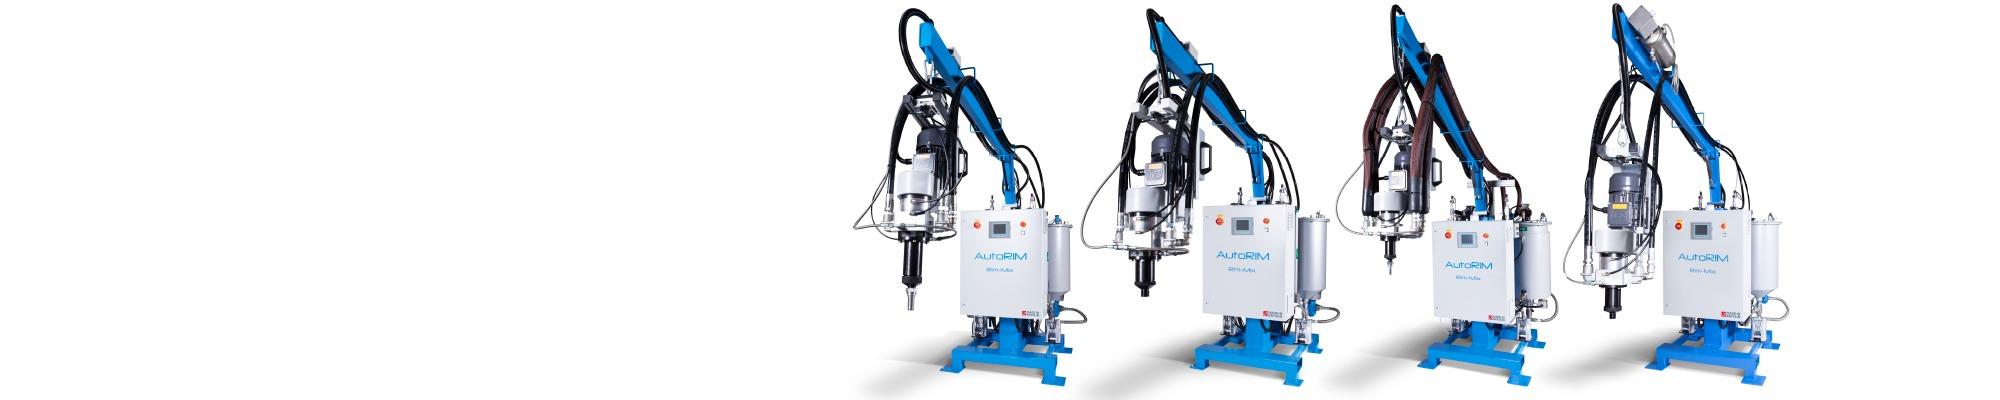 AutoRIM machines